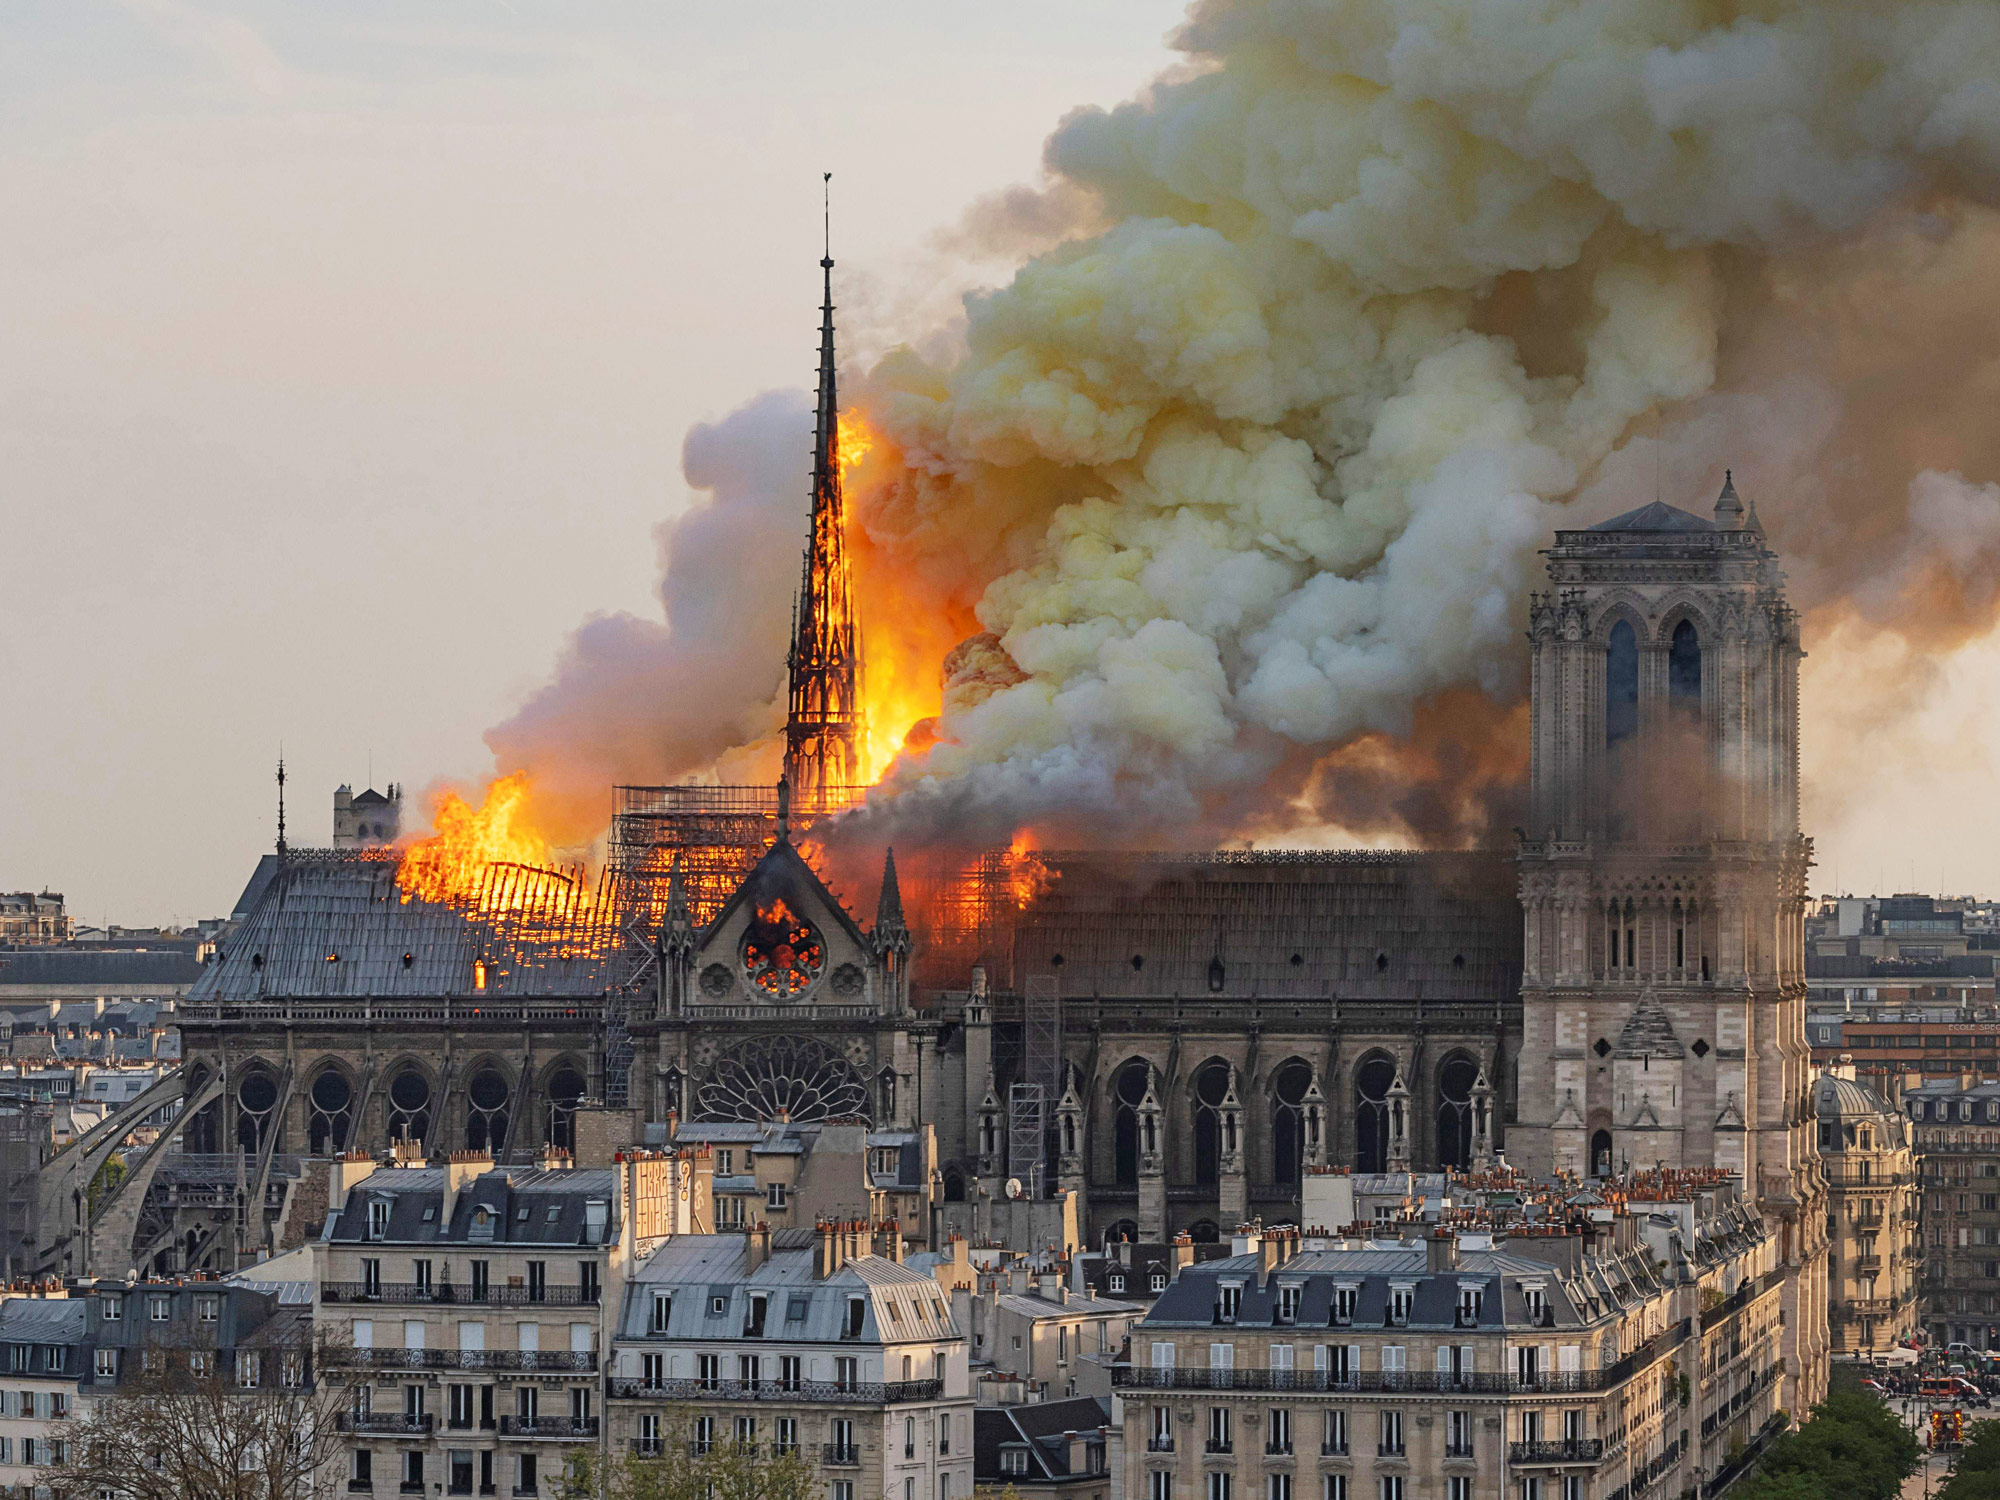 Пожар в Нотр-Даме. Апрель 2019 года. Фото – Bloomberg.